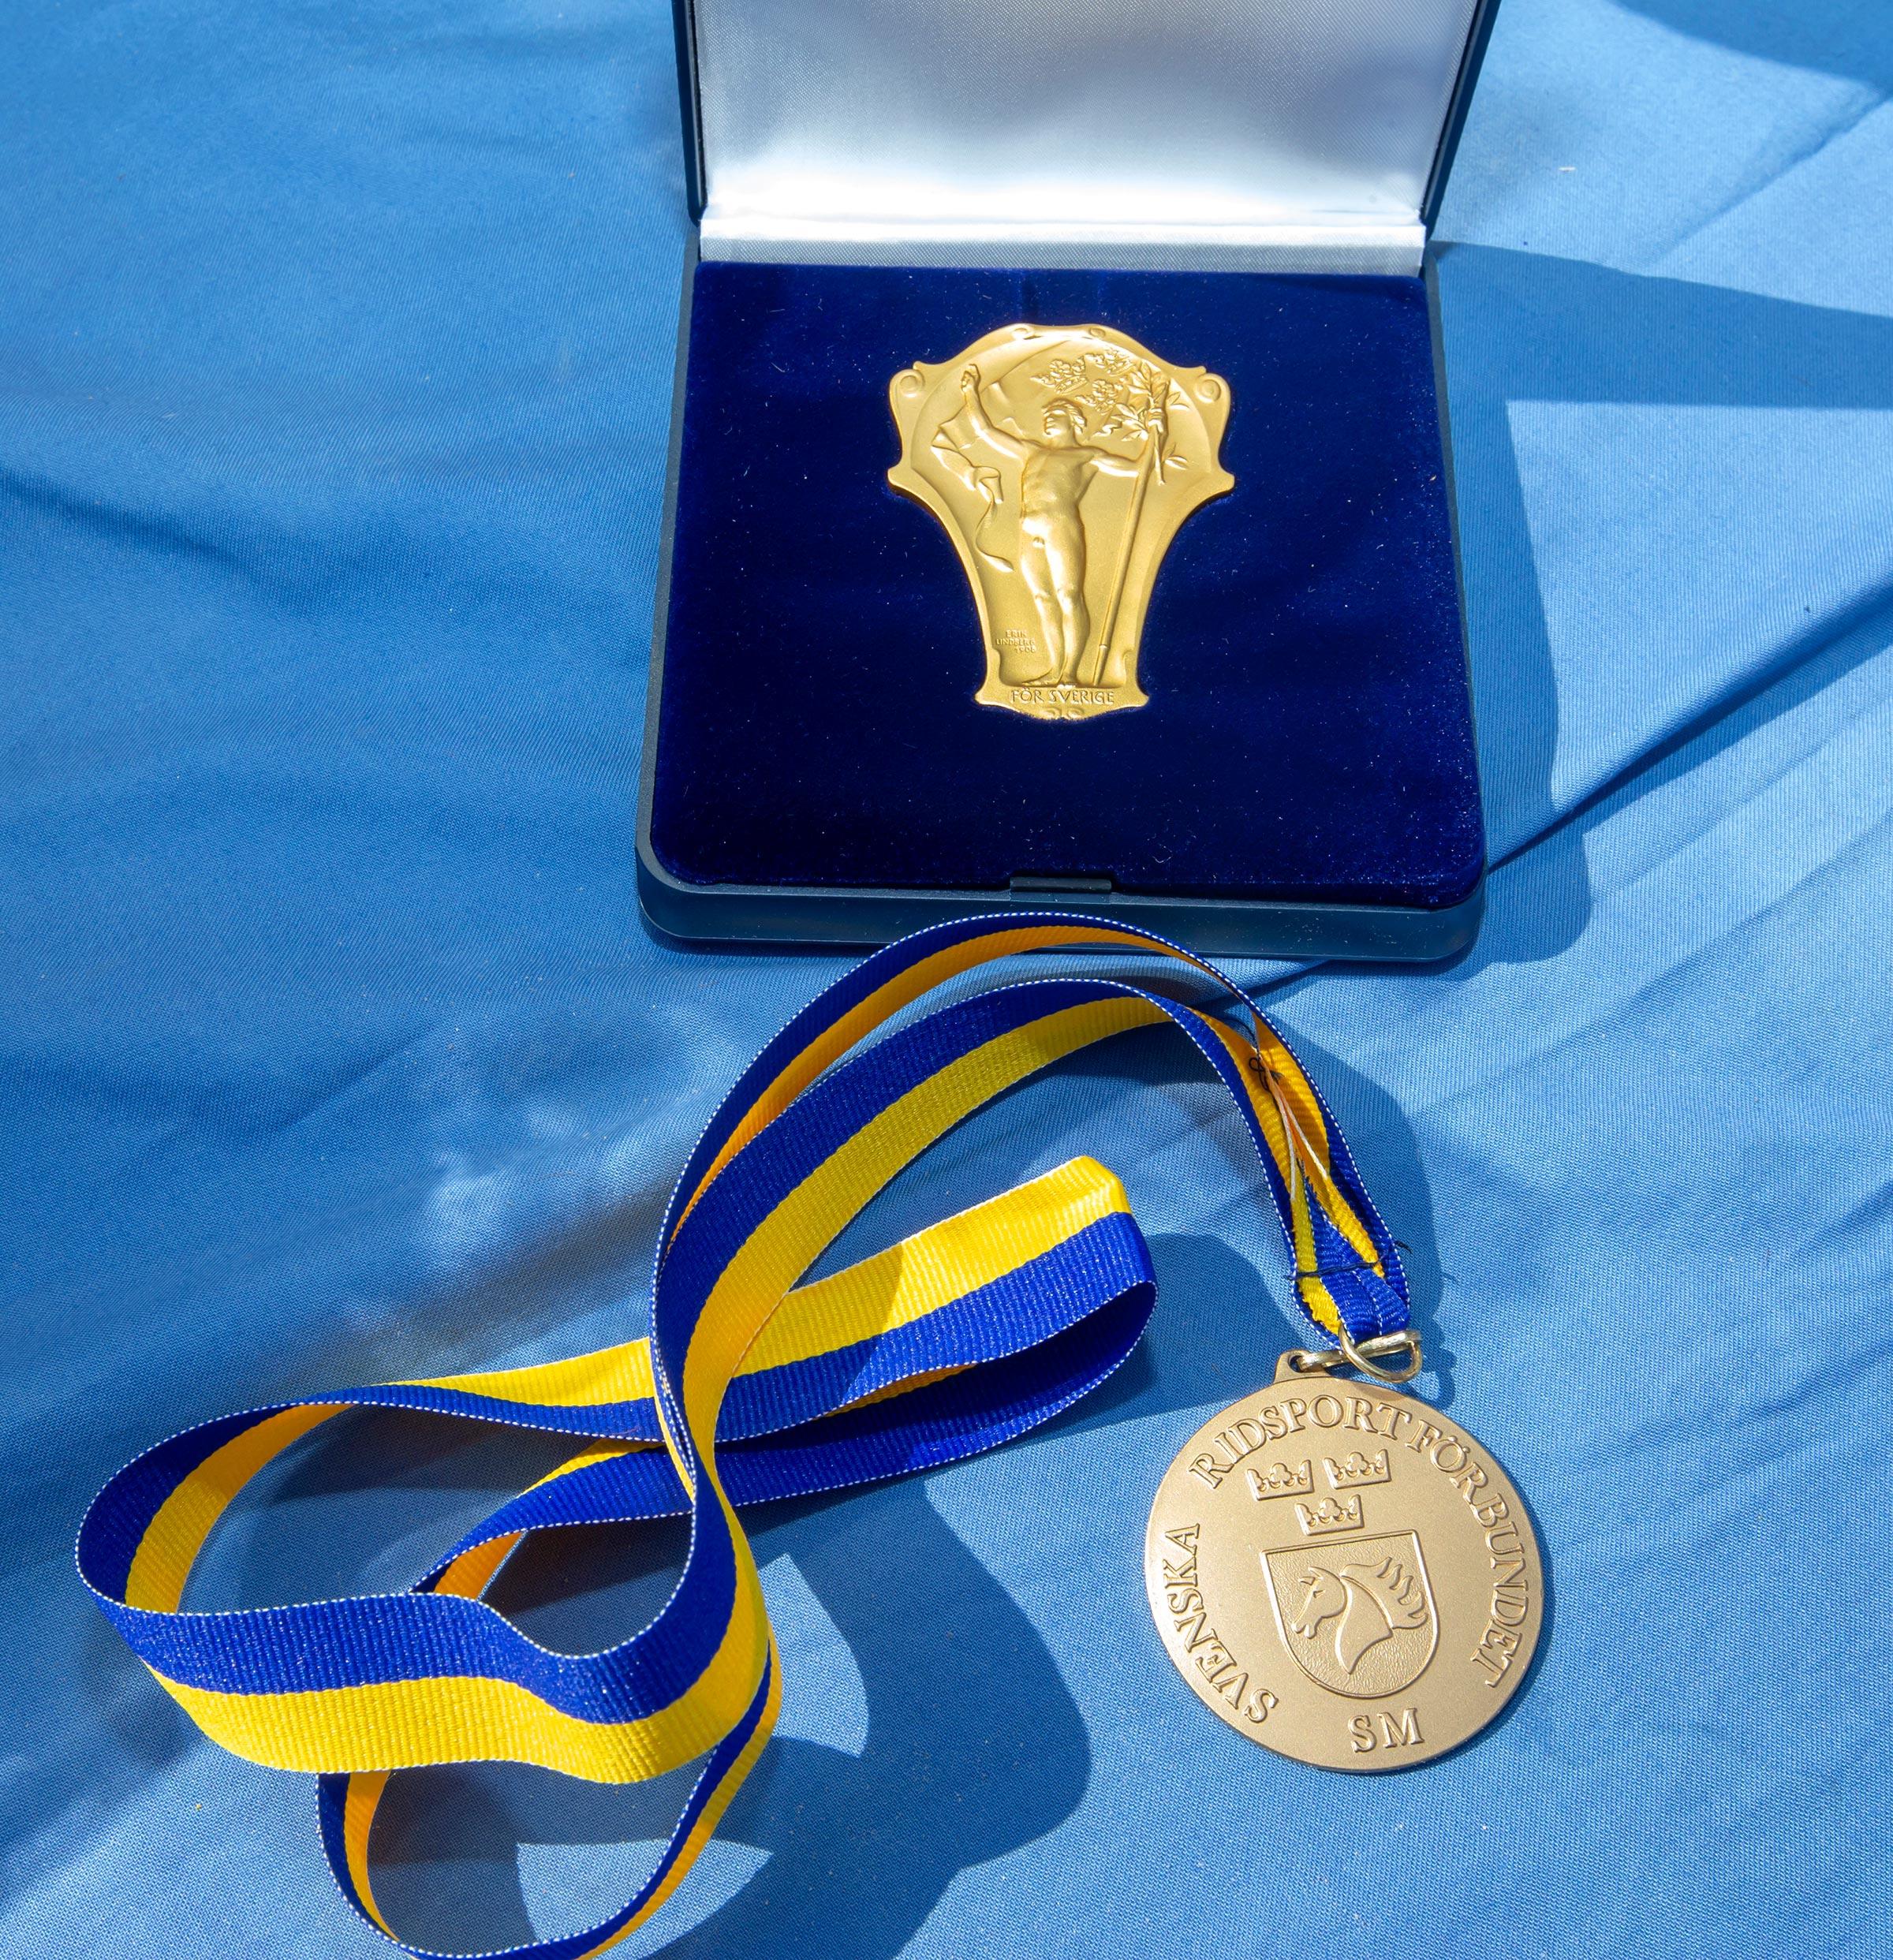 190728_sm_rolandthunholm_smmedaljer